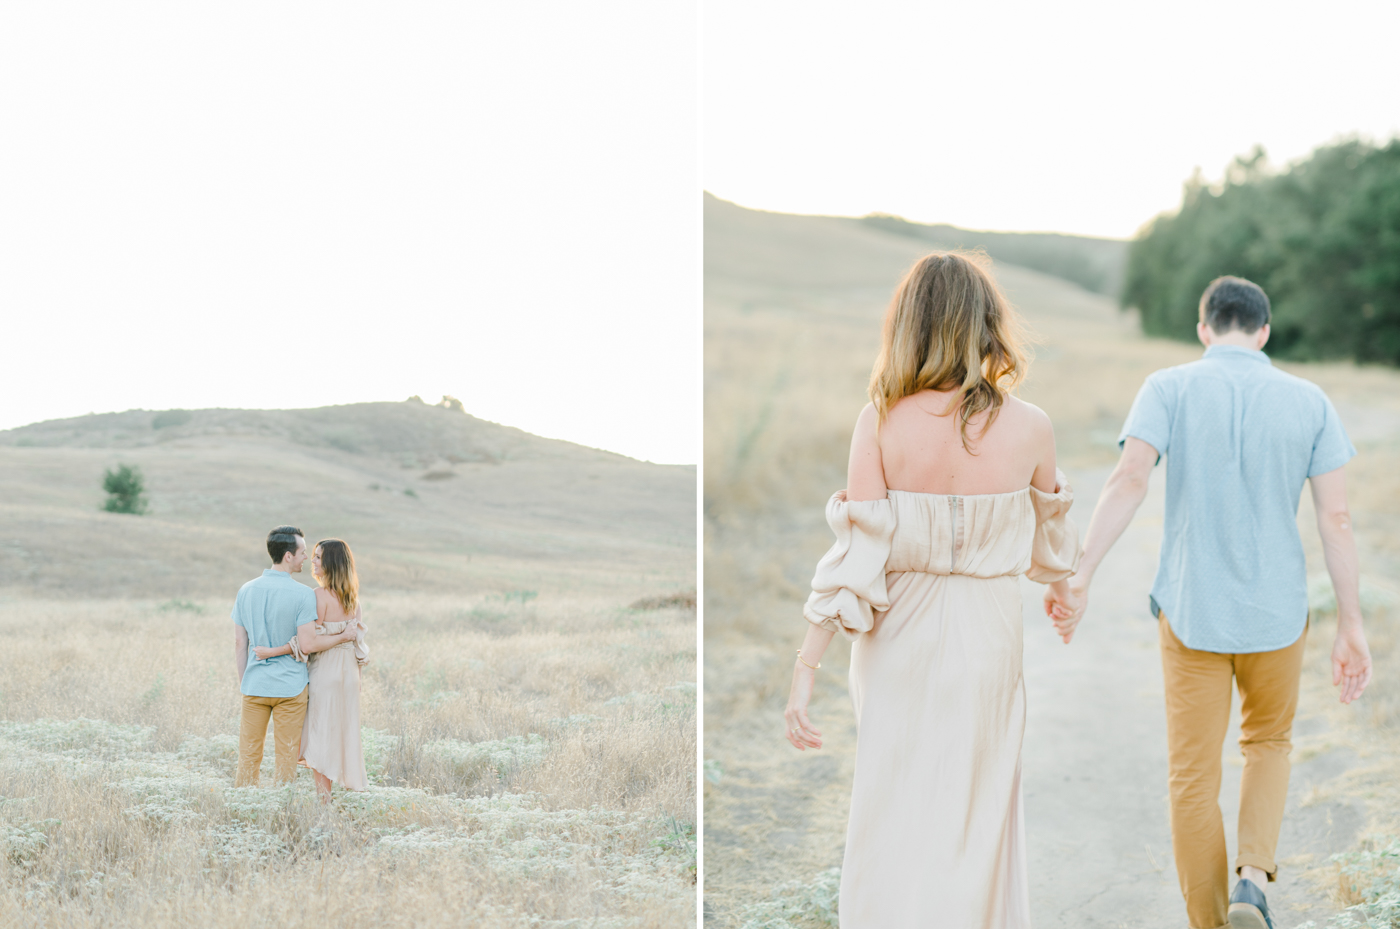 Malibu_Creek_State_Park_Romantic_Engagement_Session_C&J_romantic-16.jpg